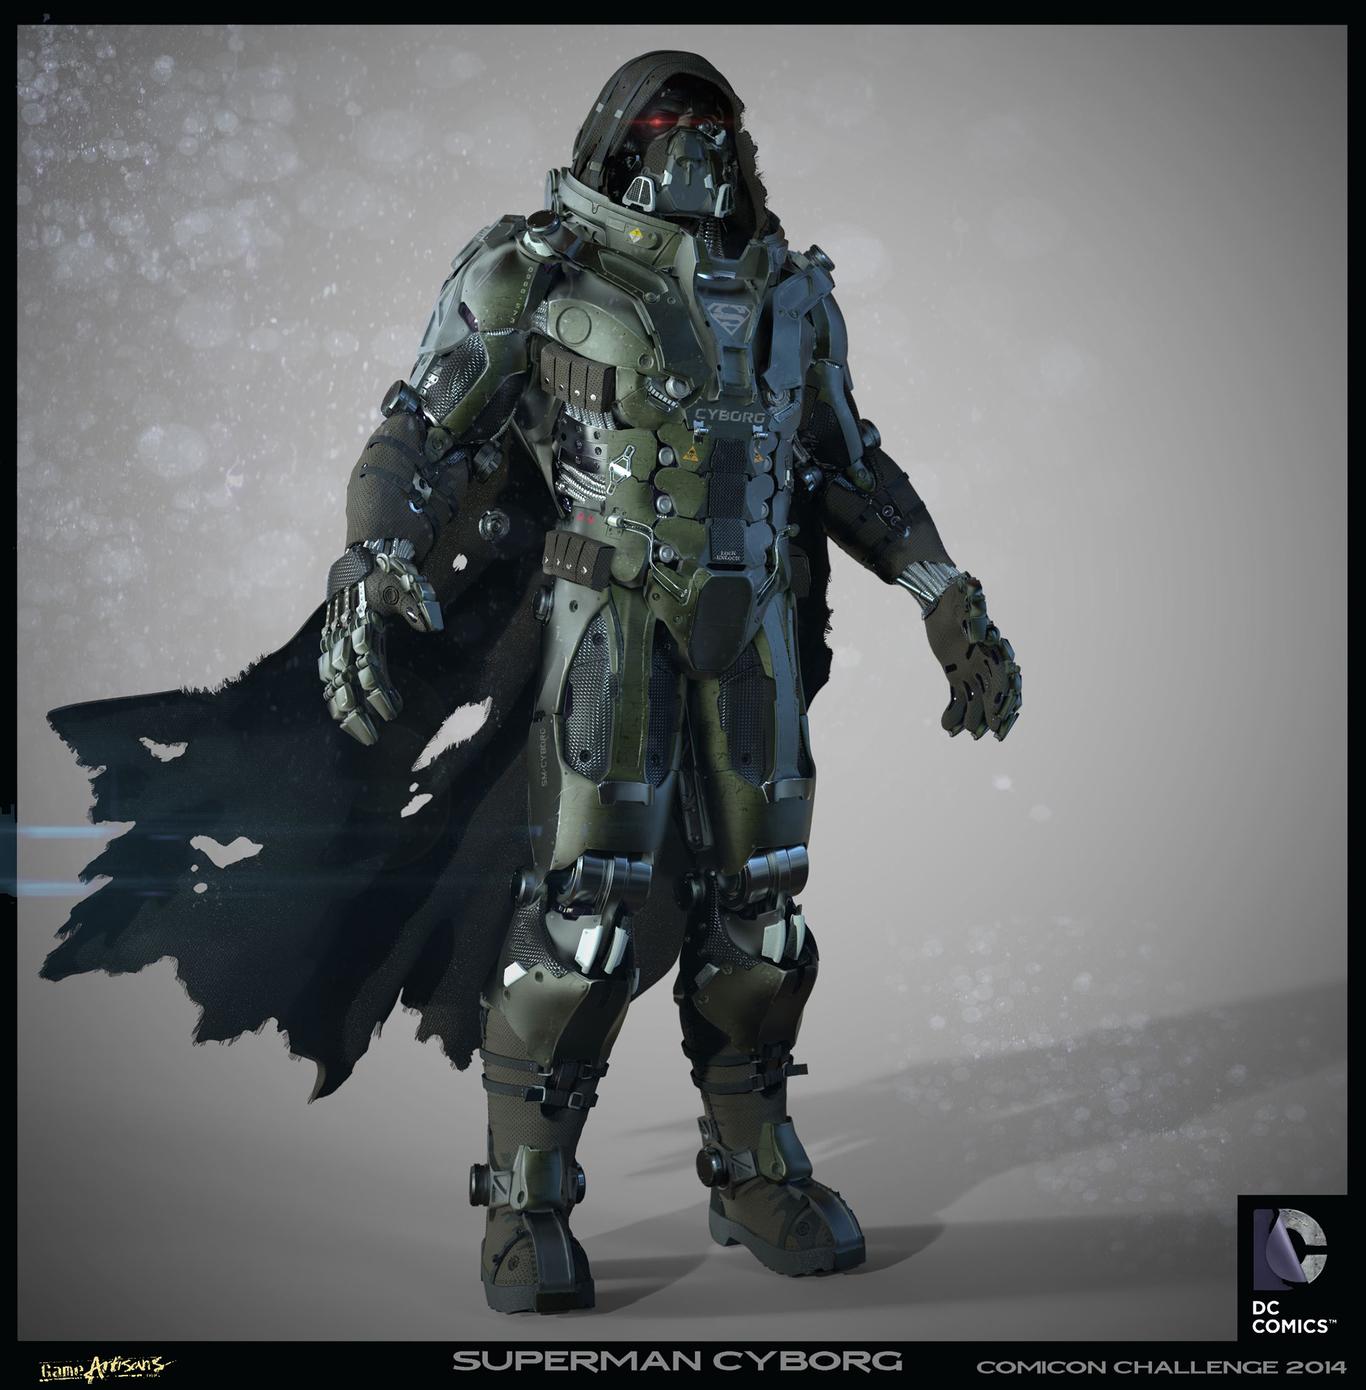 Mishmishru cyborg superman 1 50ea74b0 vid6